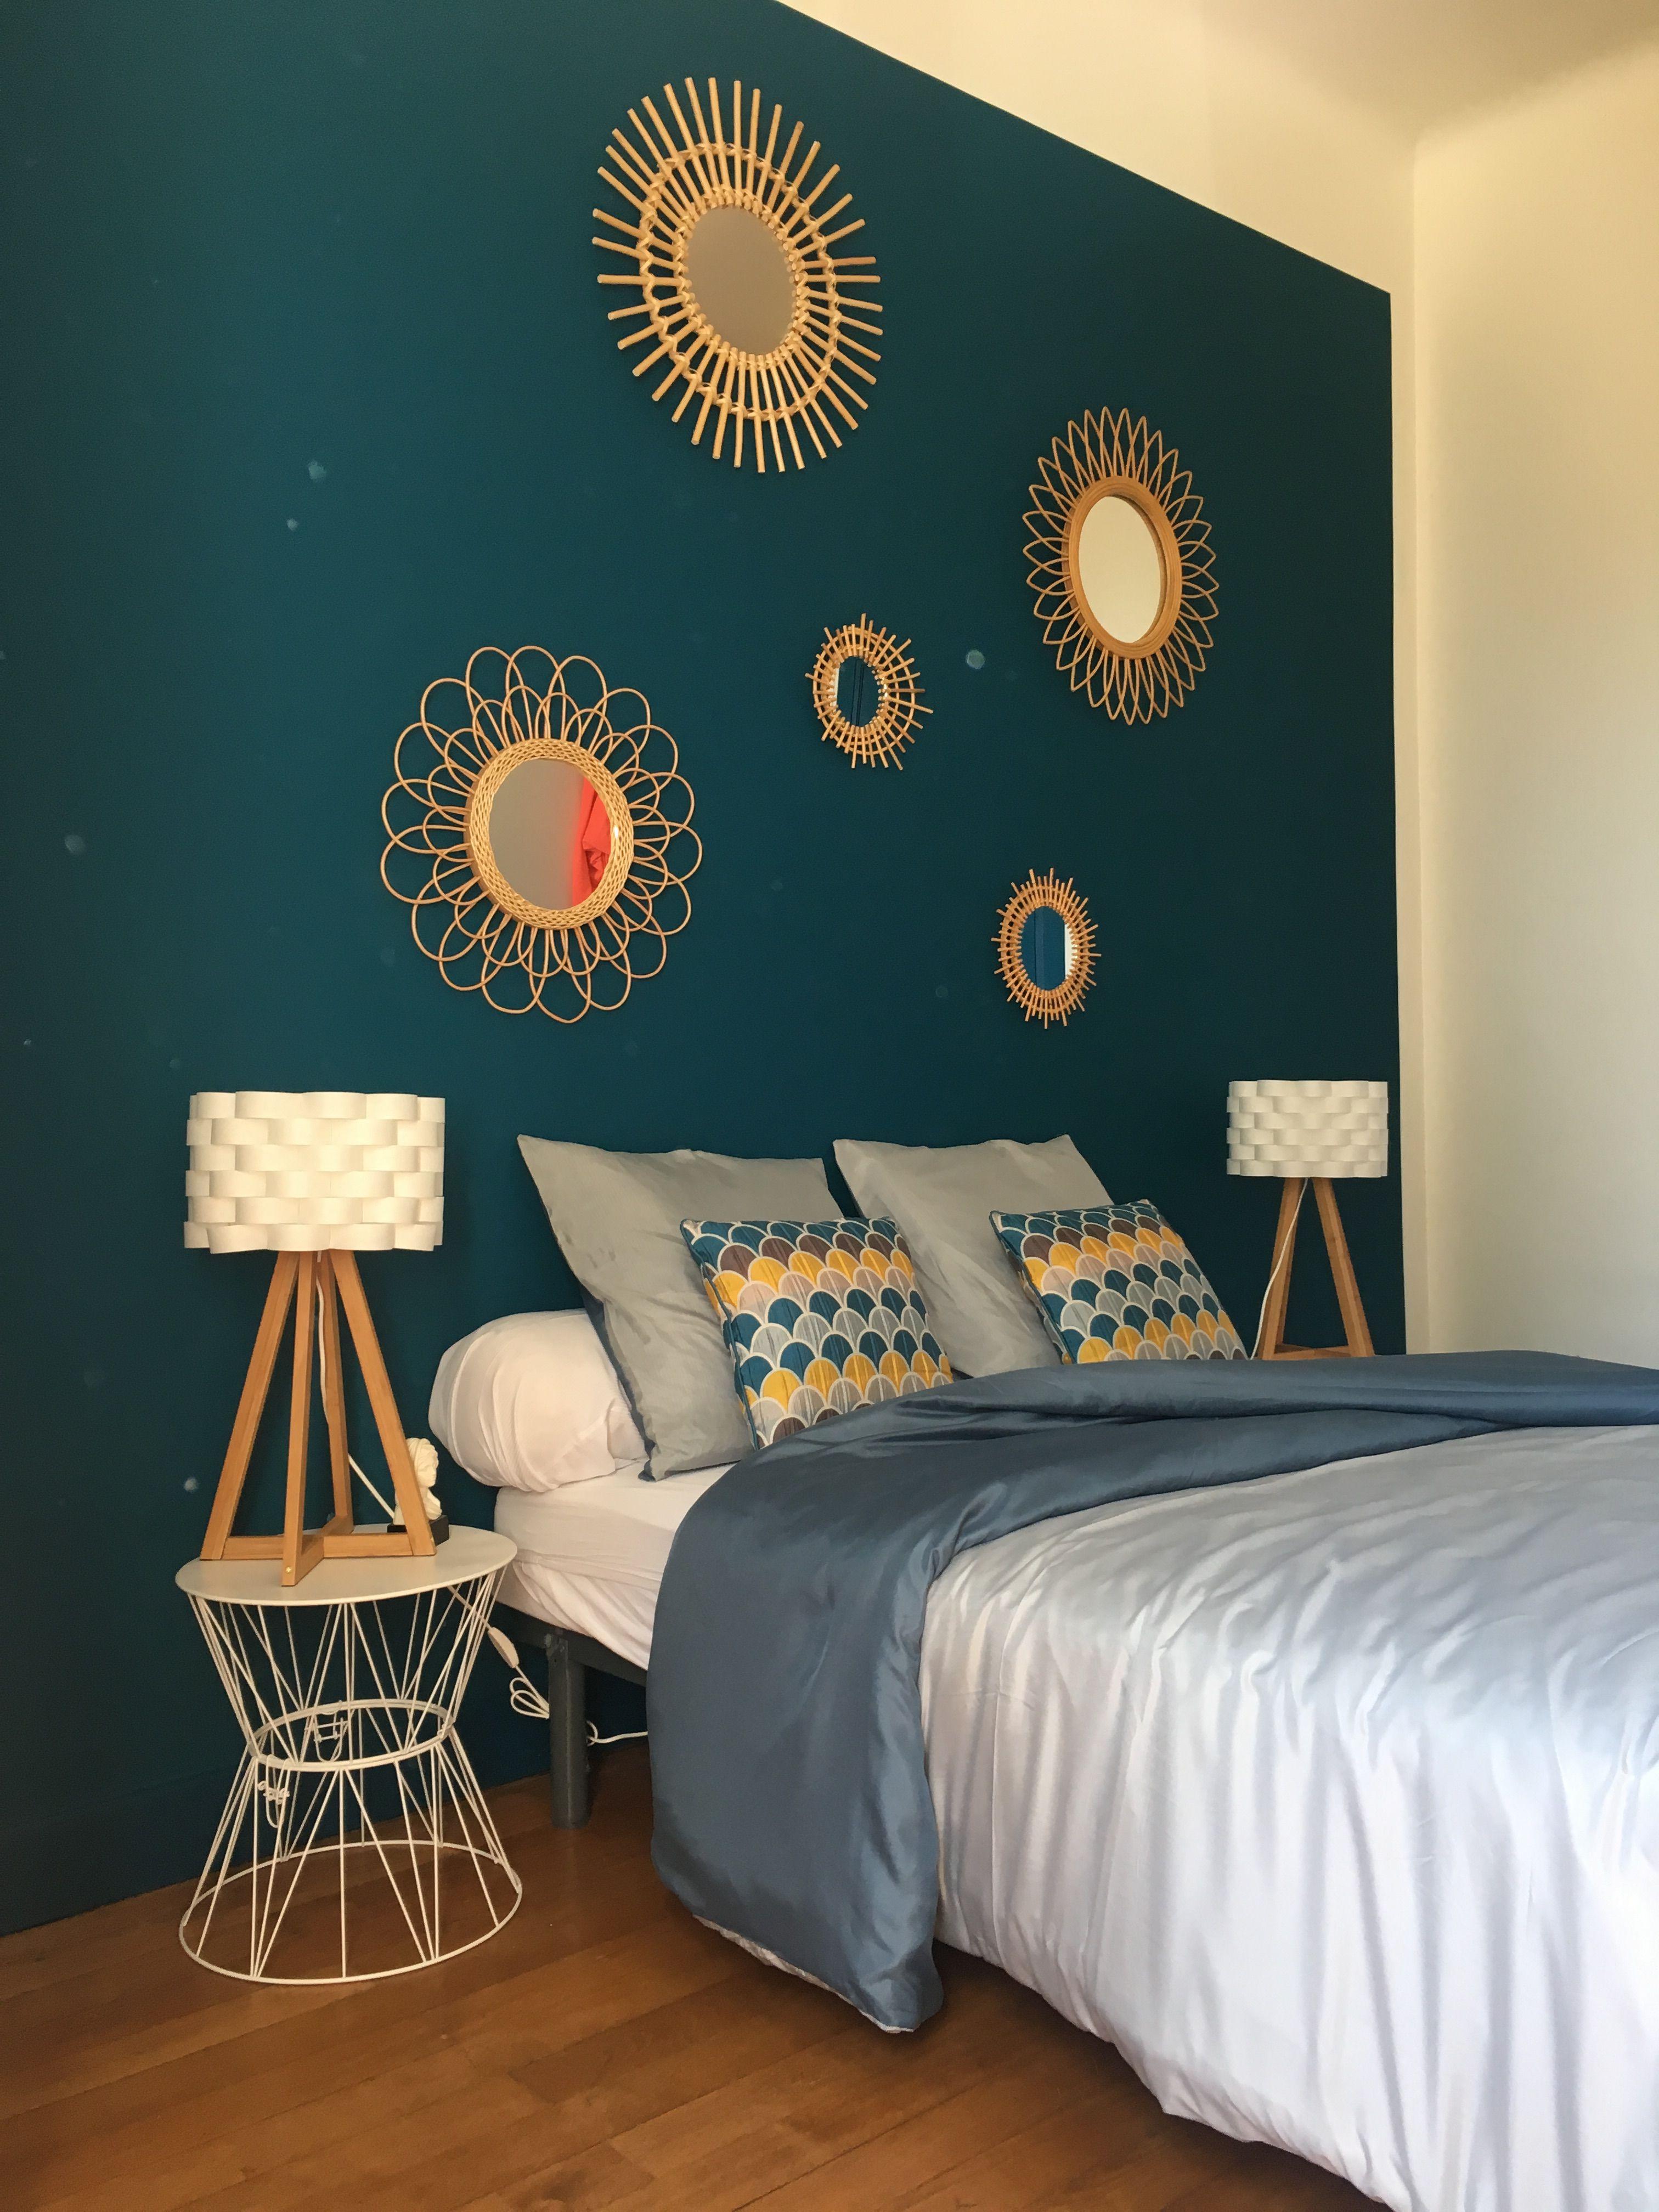 d coration naturel et scandinave peinture seigneurie bleu. Black Bedroom Furniture Sets. Home Design Ideas